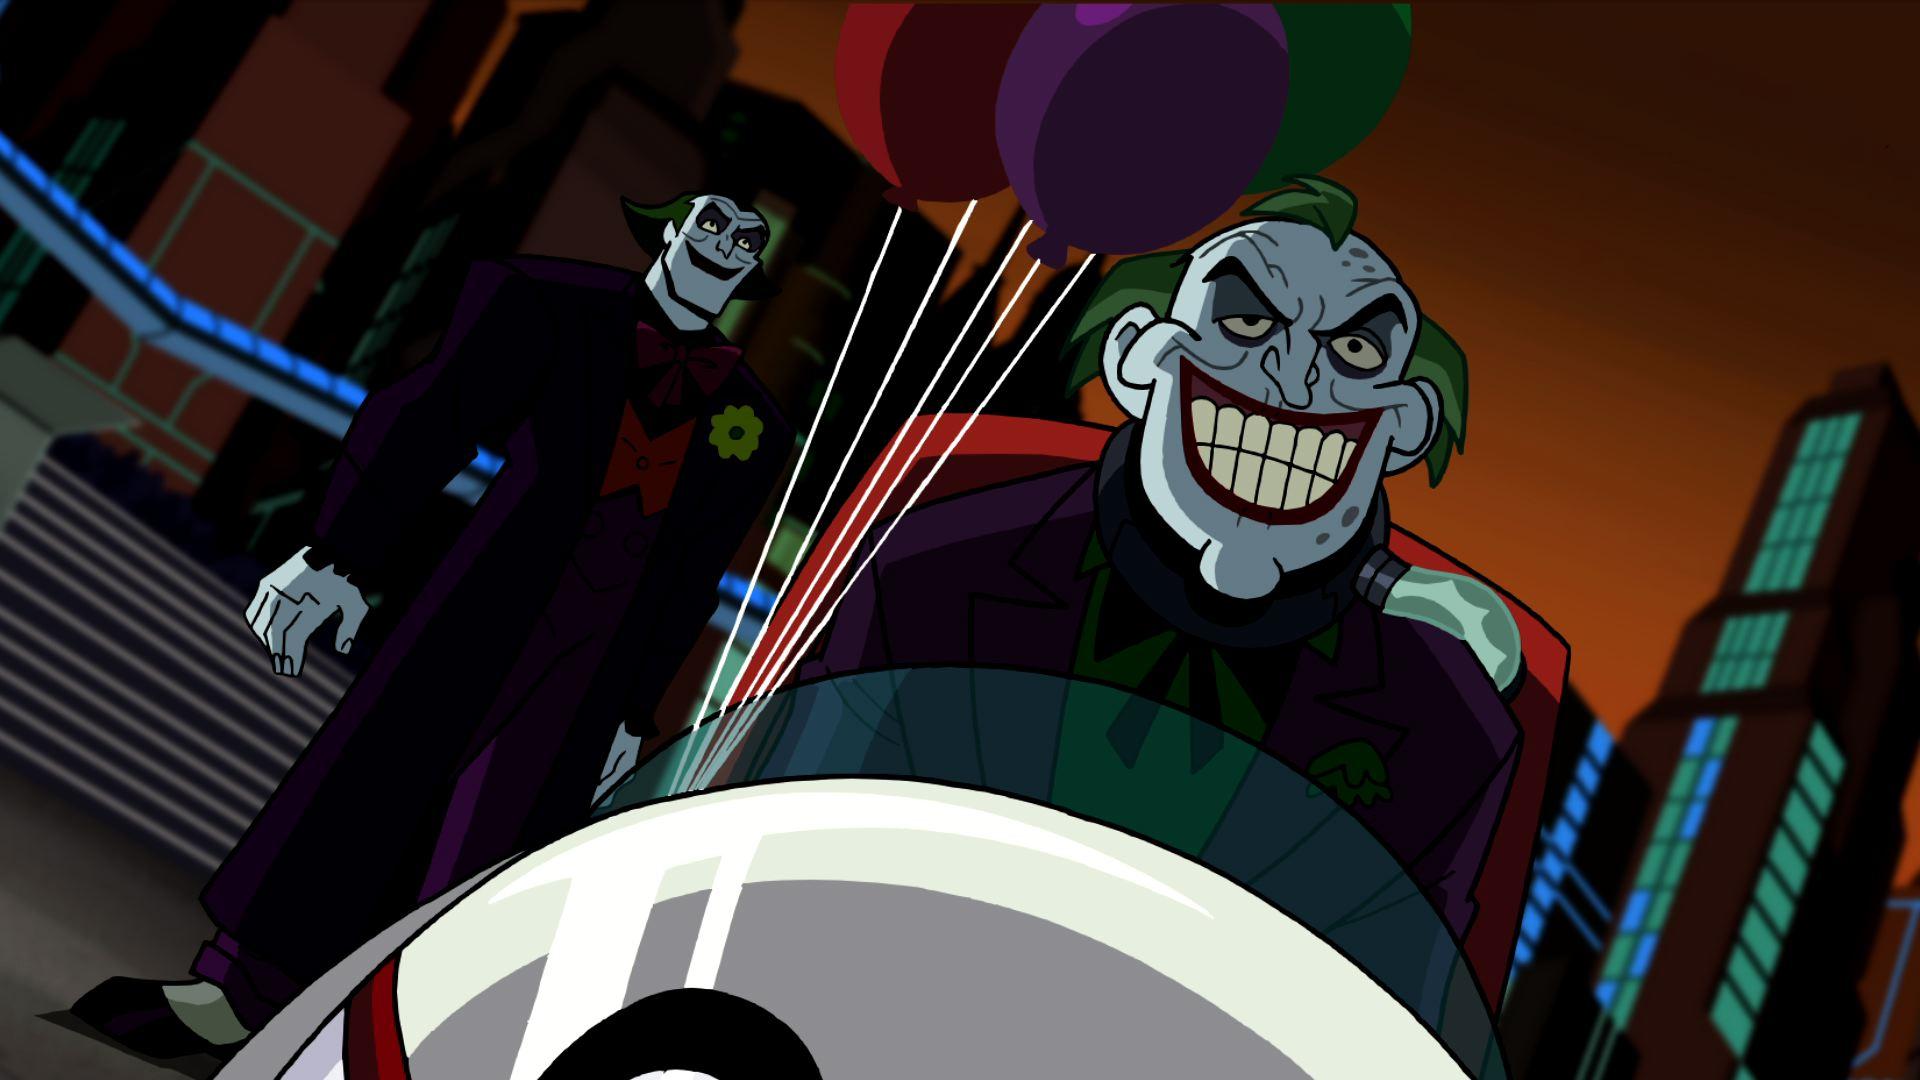 Batman The Brave And The Bold Damian Wayne Dick grayson y damian wayneBatman The Brave And The Bold Damian Wayne